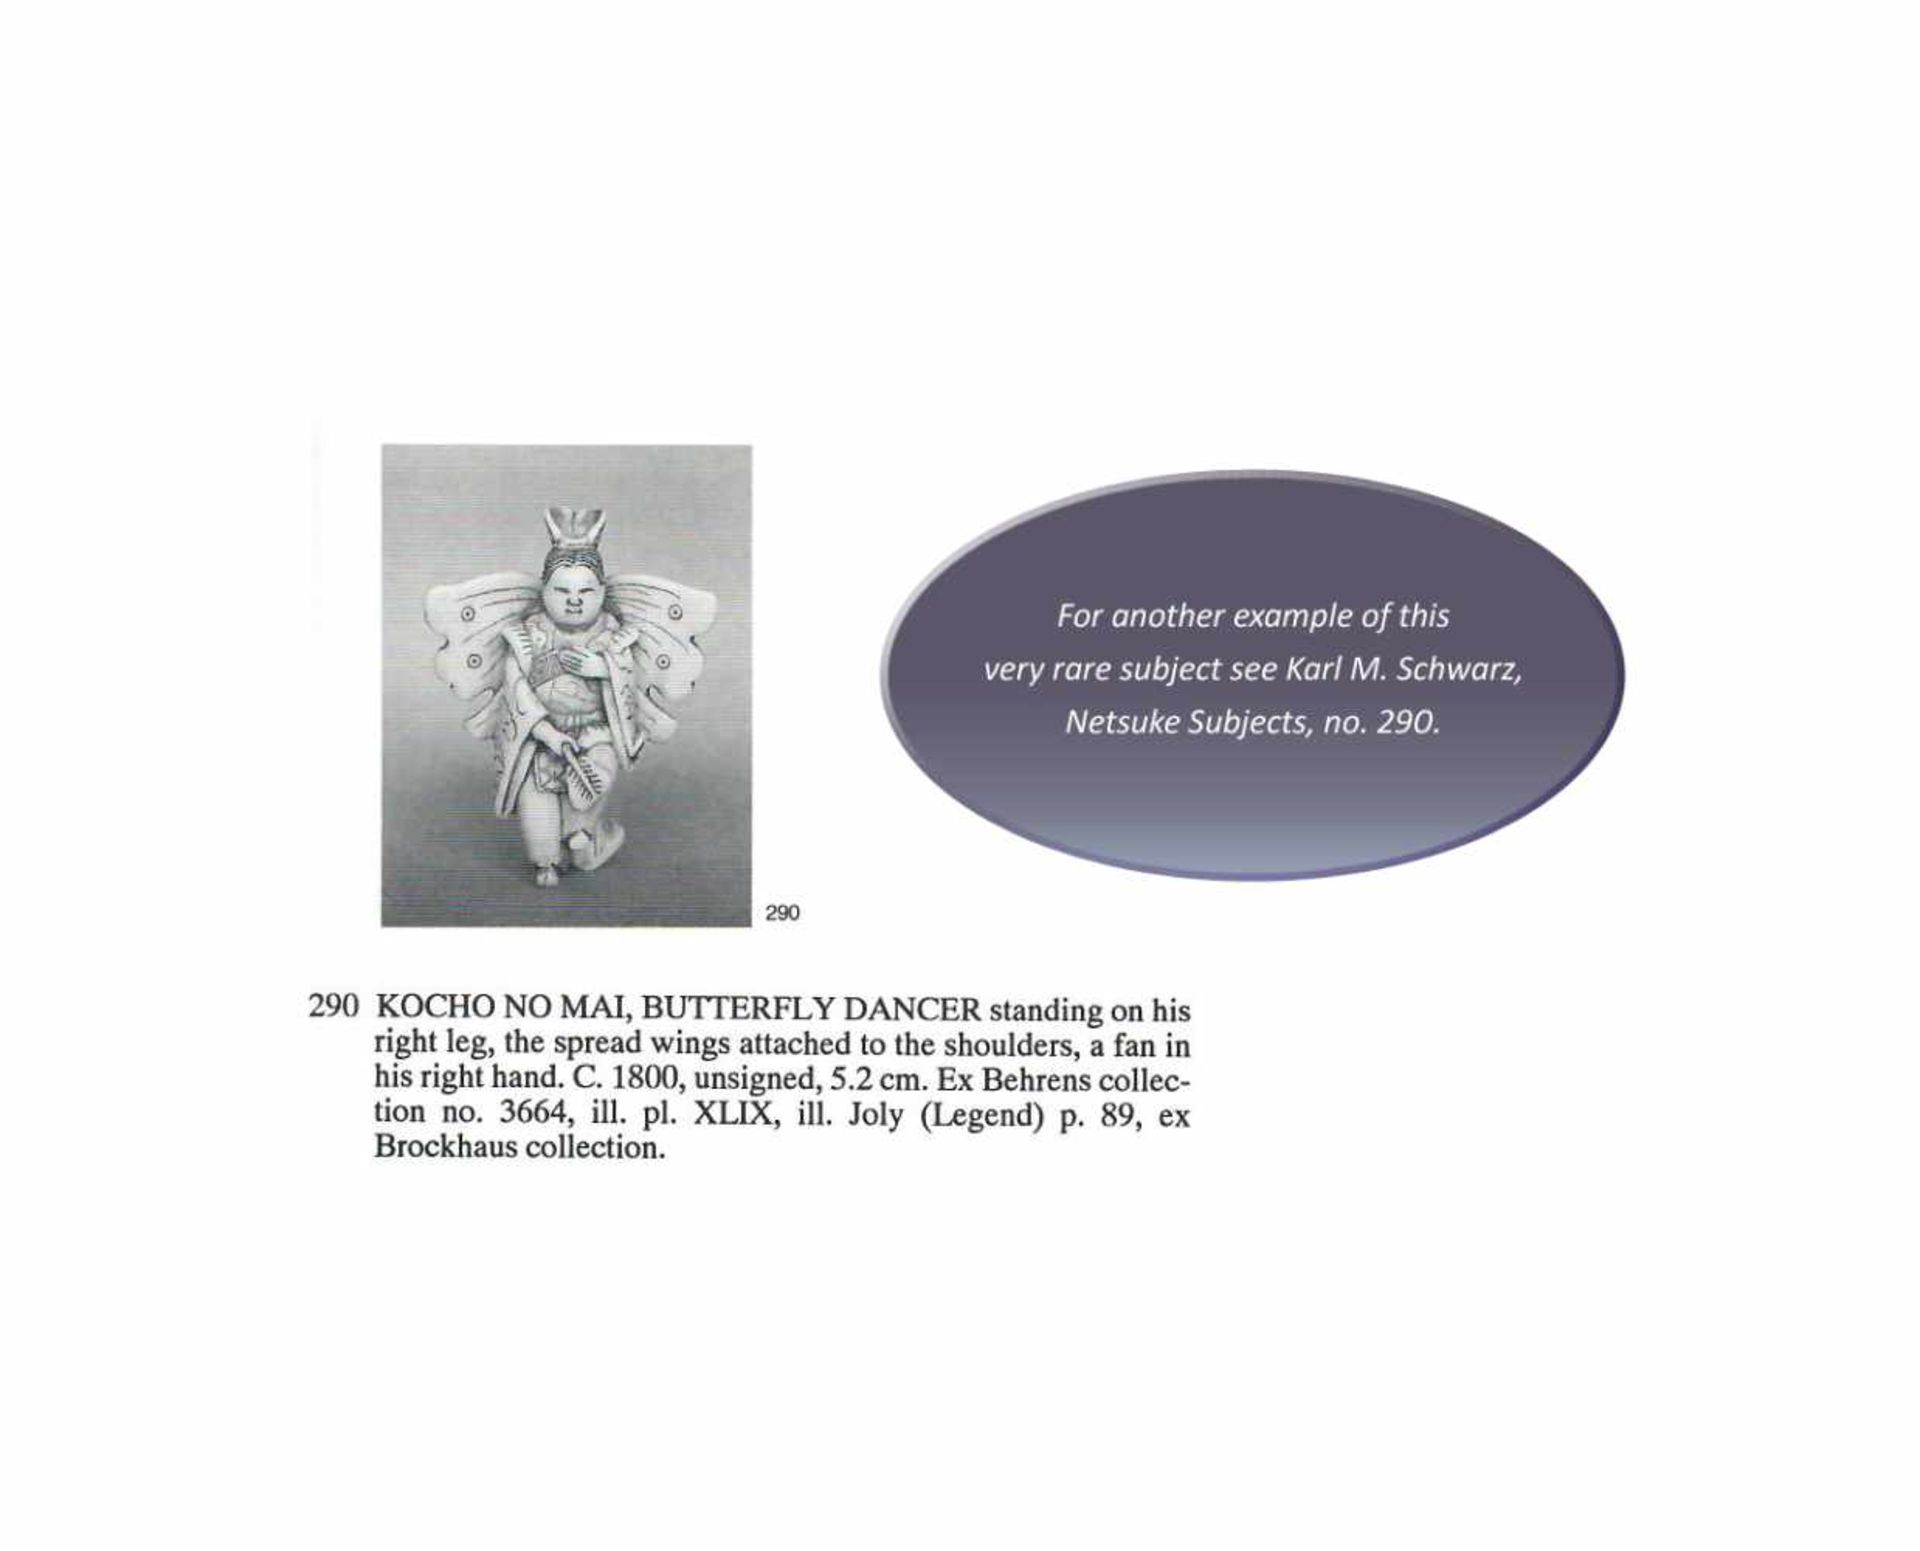 MASAHIRO: A VERY RARE IVORY NETSUKE OF A BUTTERFLY DANCER, KOCHO NO MAI By Masahiro, signed - Image 13 of 13